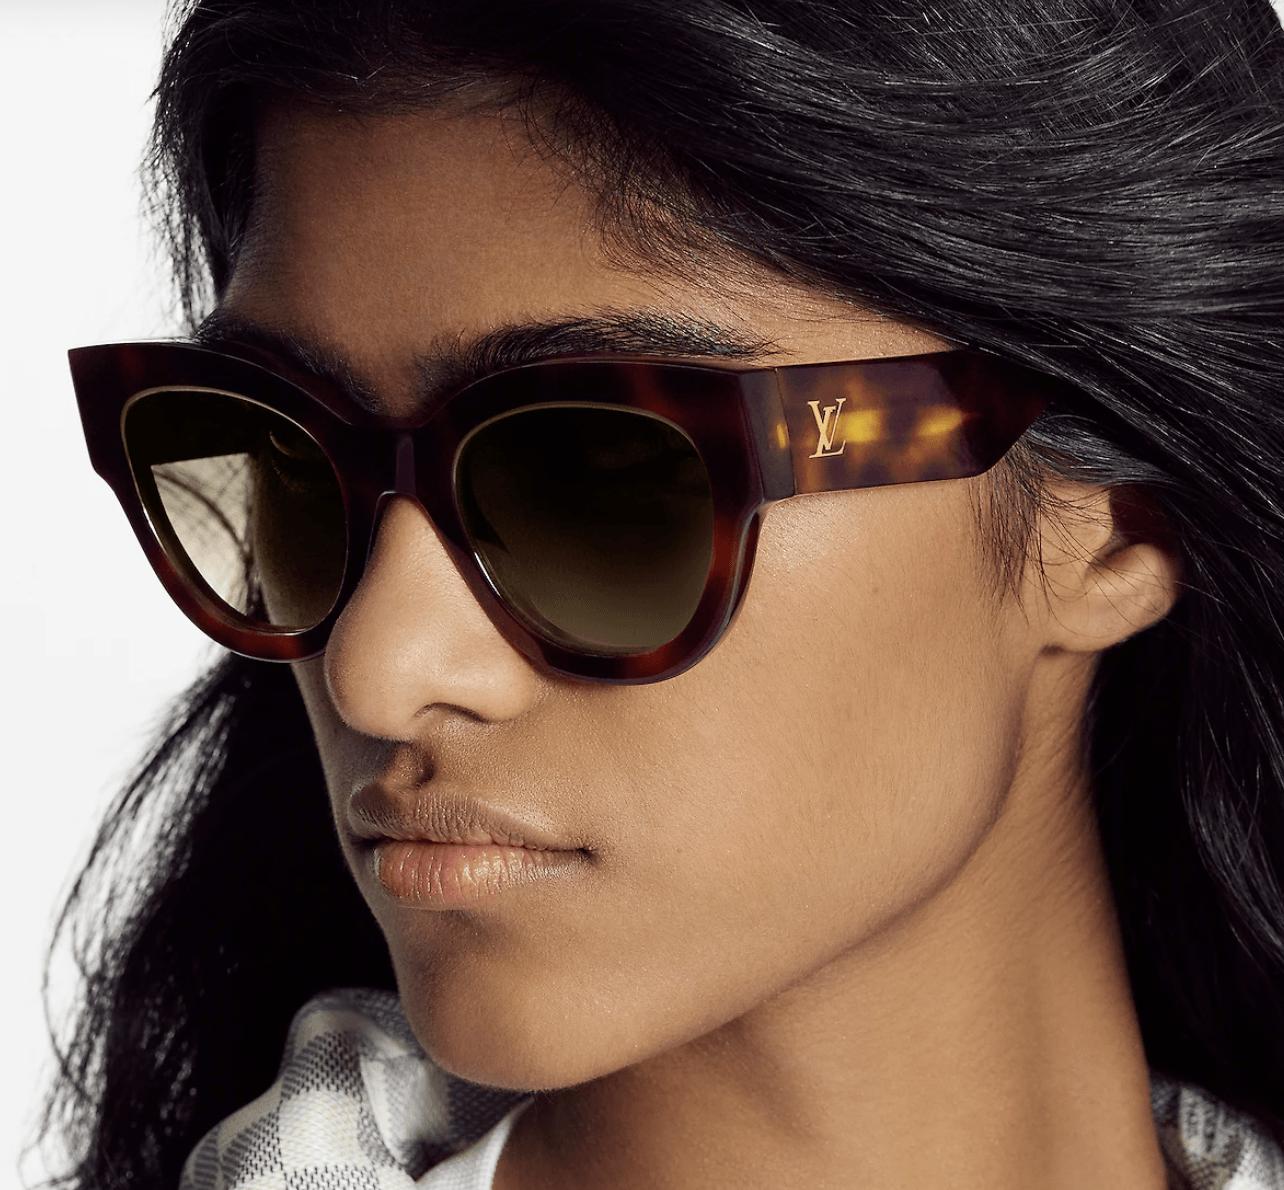 Louis Vuitton - Sunglasses - NAPALI for WOMEN online on Kate&You - Z1461W K&Y10649